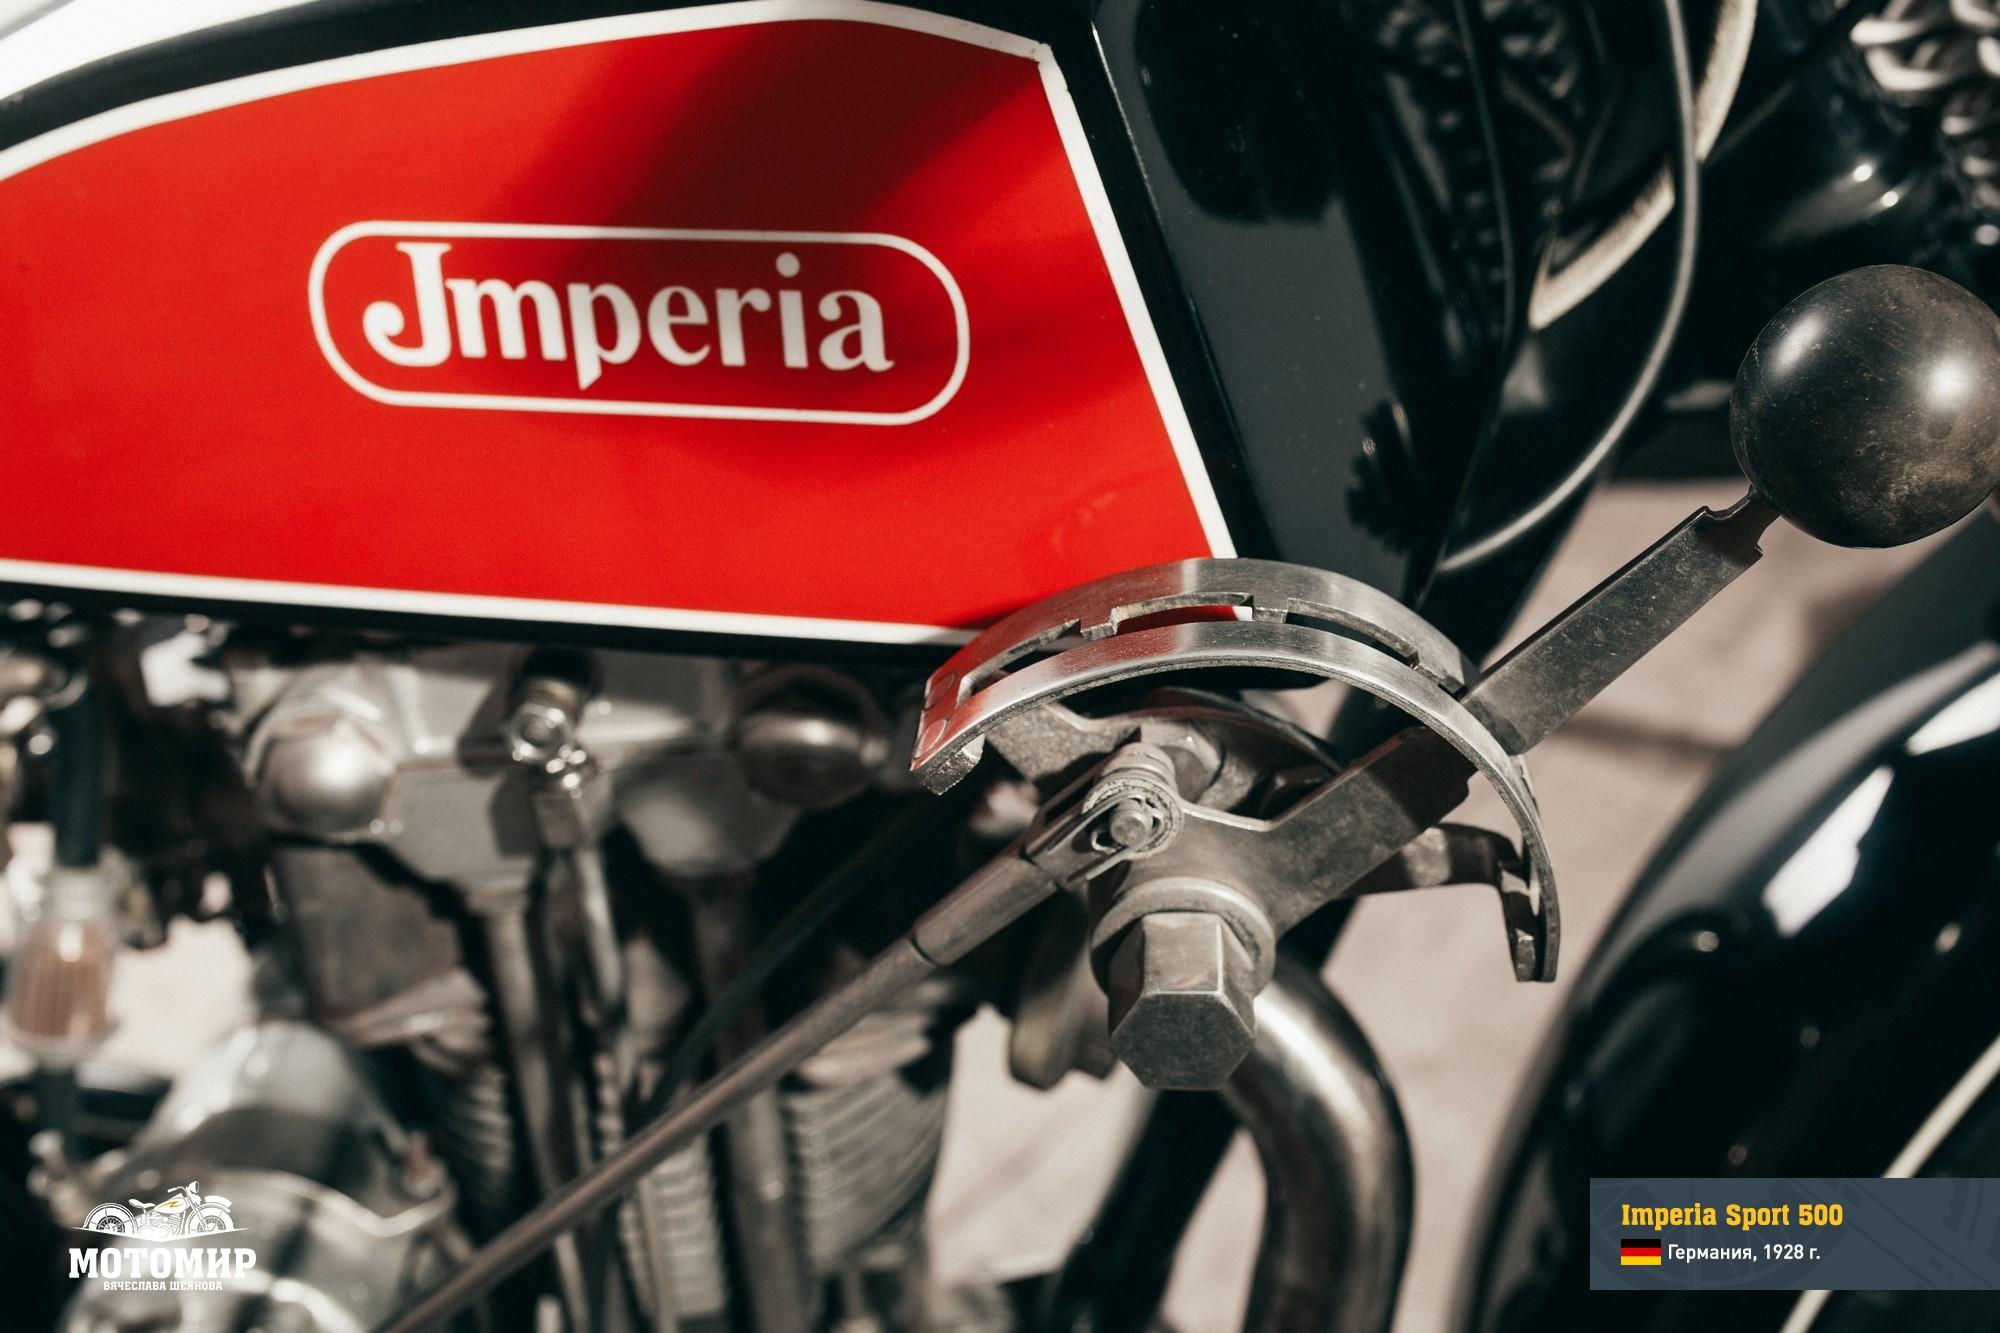 imperia-sport-500-201601-web-19